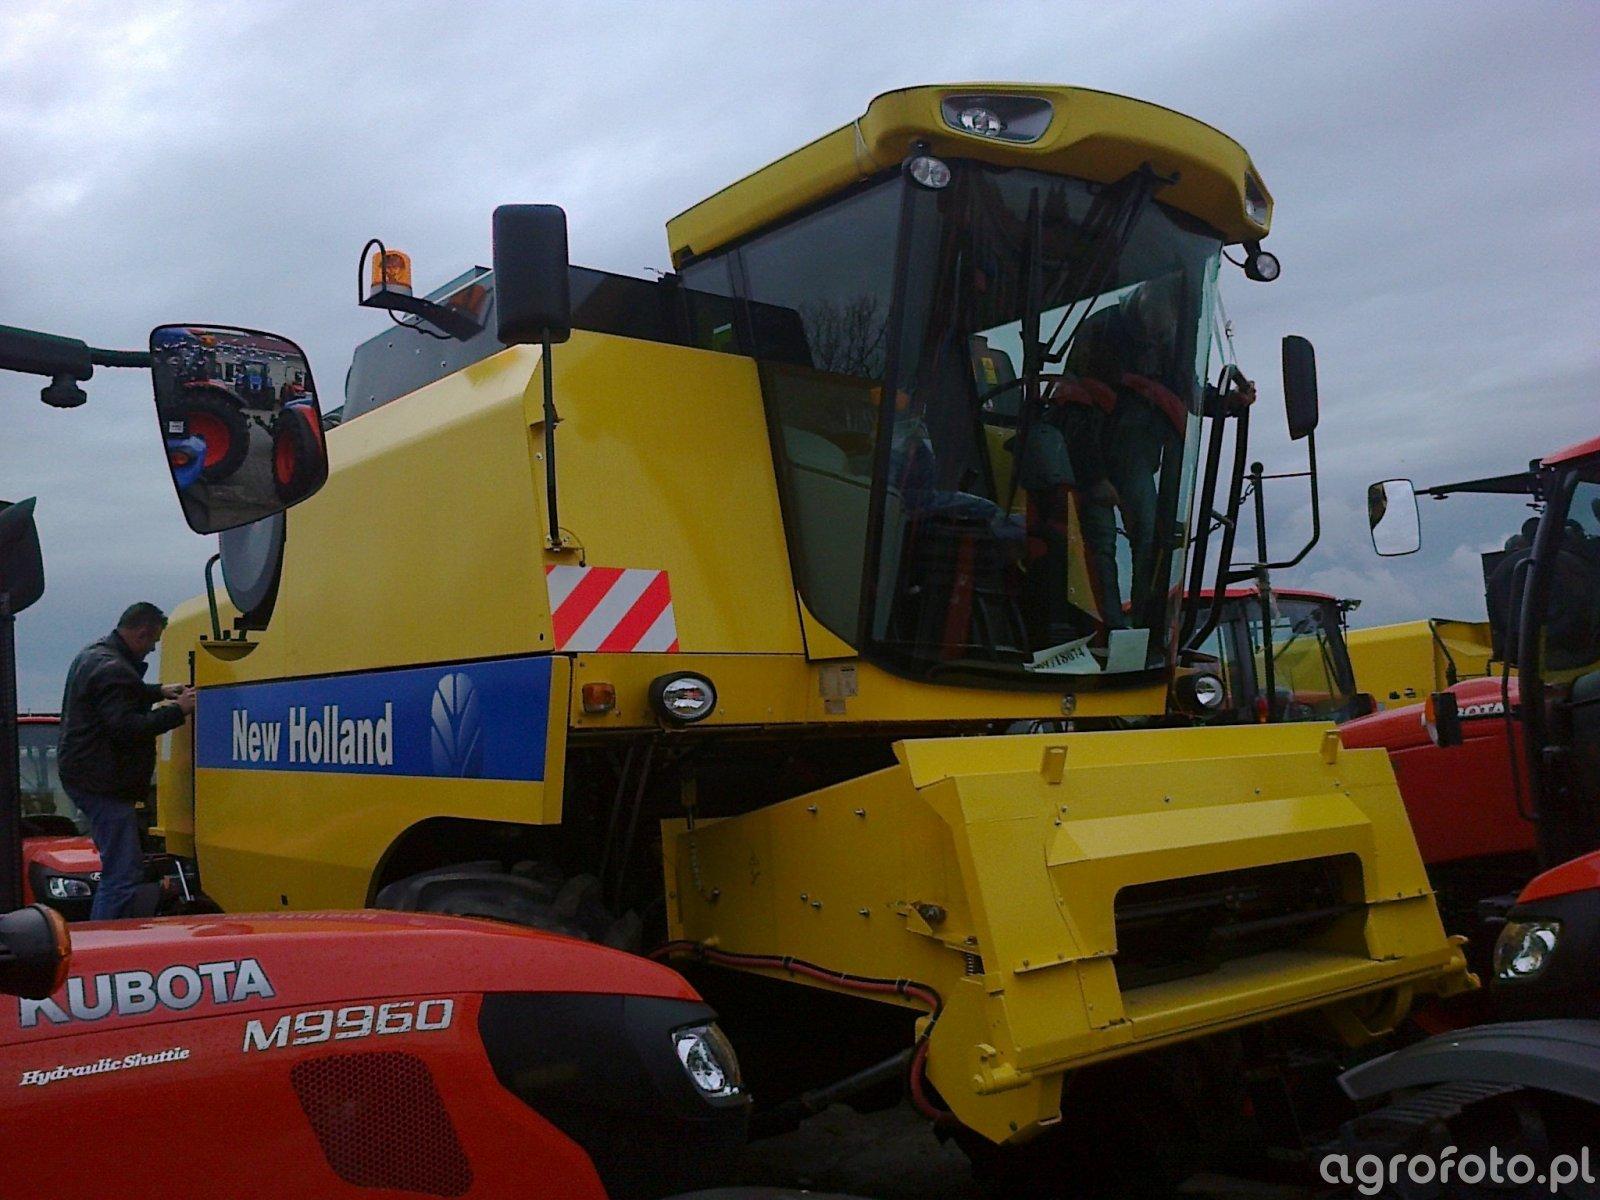 New Holland TC5060